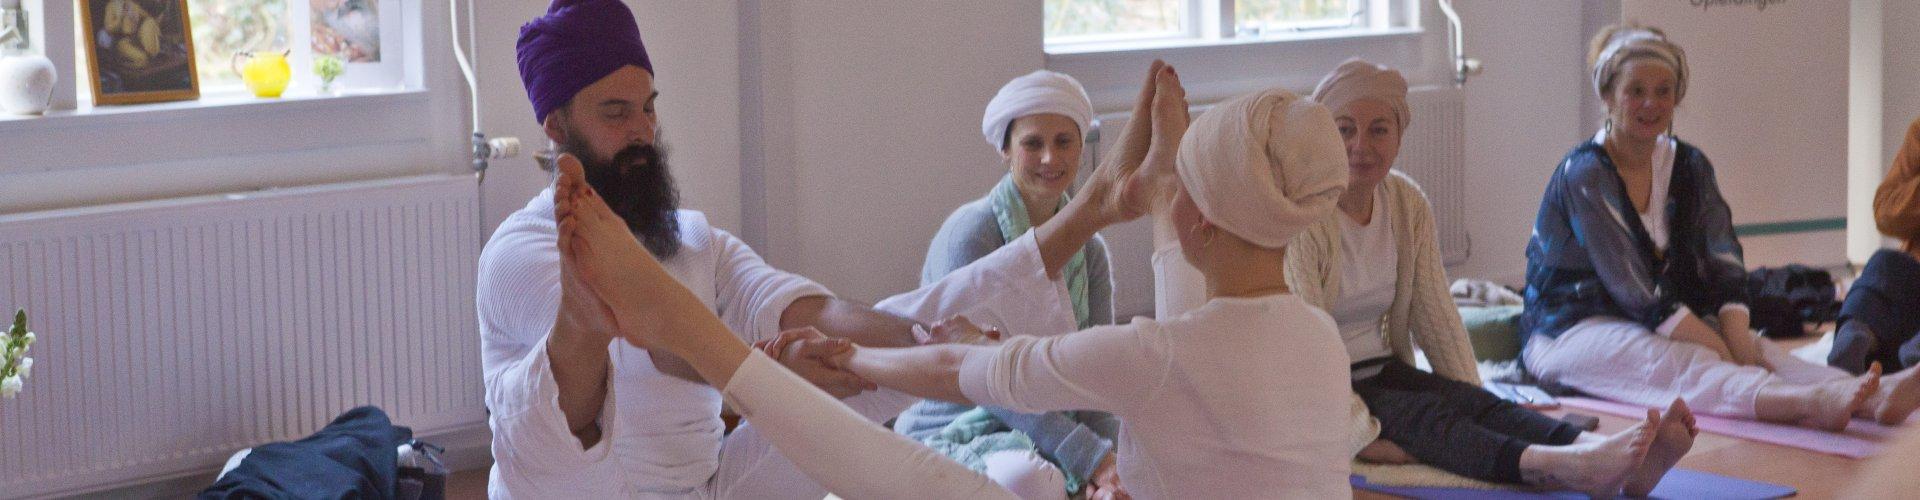 yogi workshop kundalini yoga meditatie guru gian kracht energie spiritualiteit amsterdam verdieping